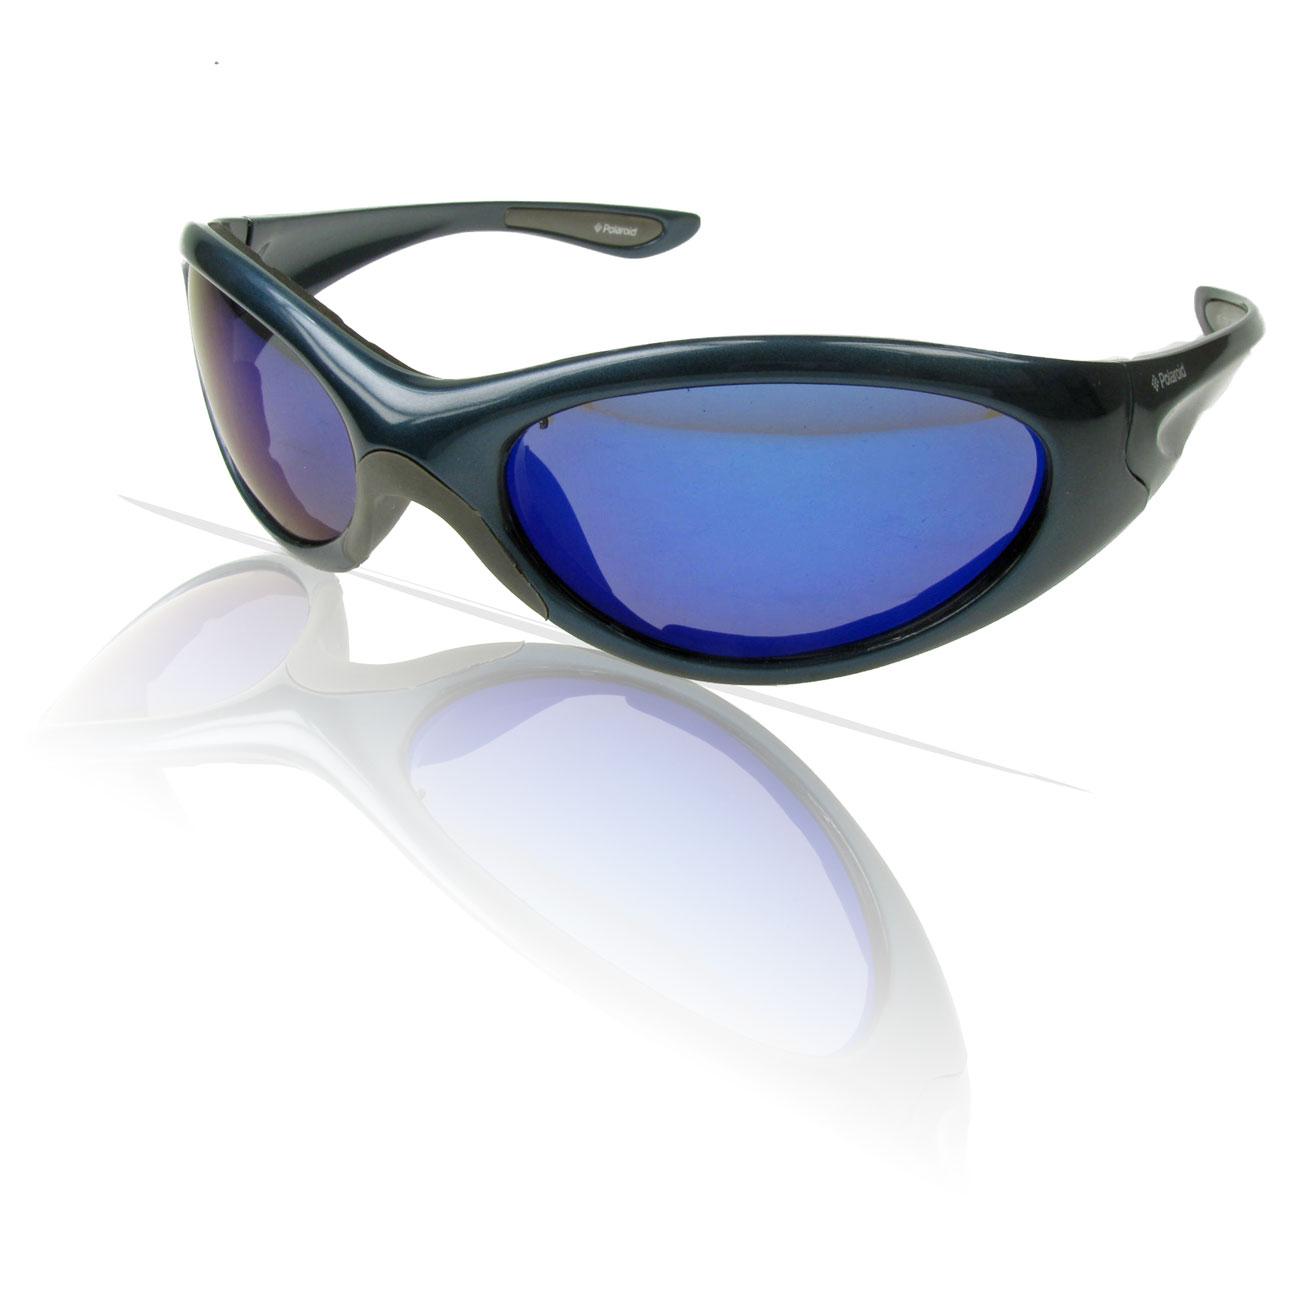 e858f5282a99 Polarized Sunglasses Definition